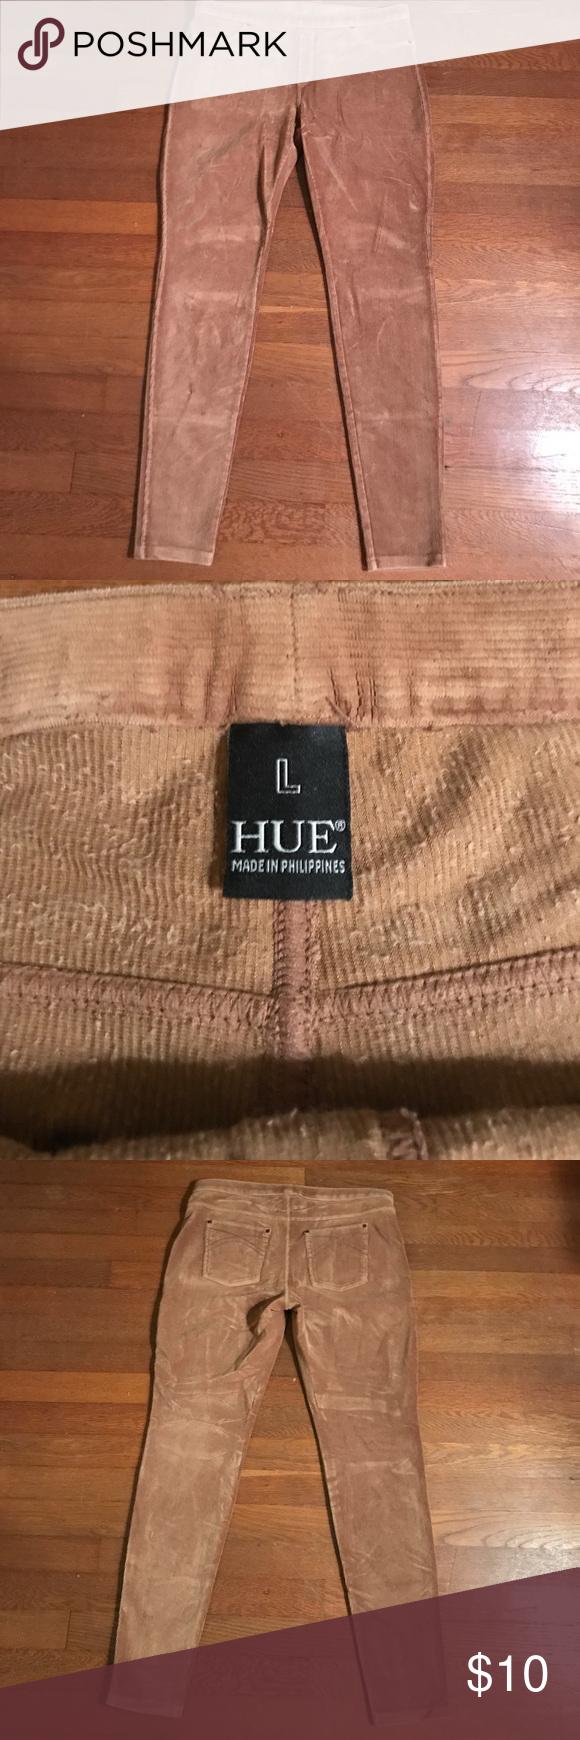 583aa72b2f697 Hue Corduroy Leggings Tan Hue Corduroy leggings. Comfy and perfect for  Fall! HUE Pants Leggings